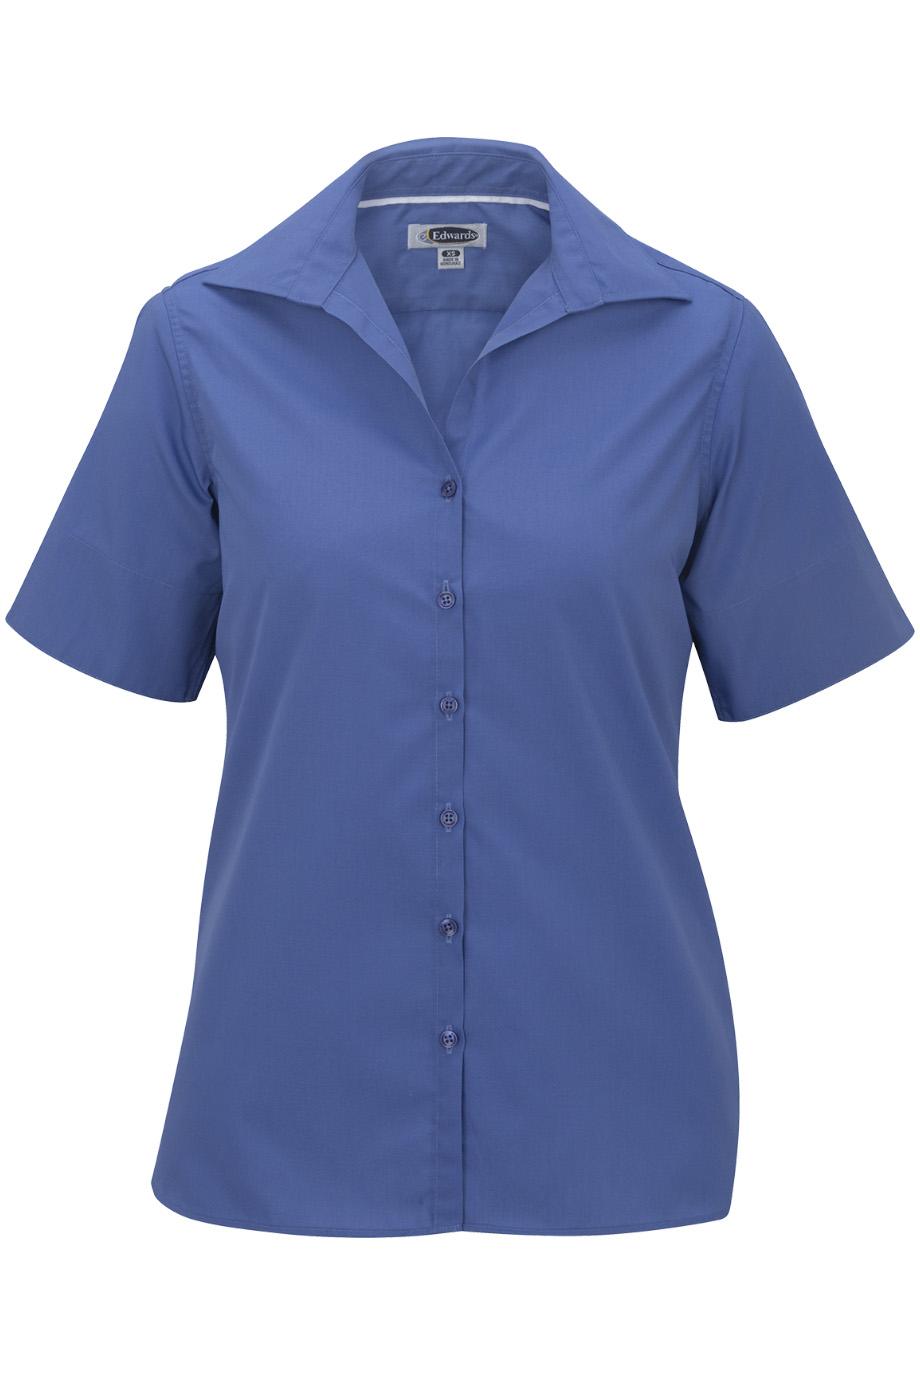 Ladies' Lightweight Short Sleeve Poplin Blouse 5245